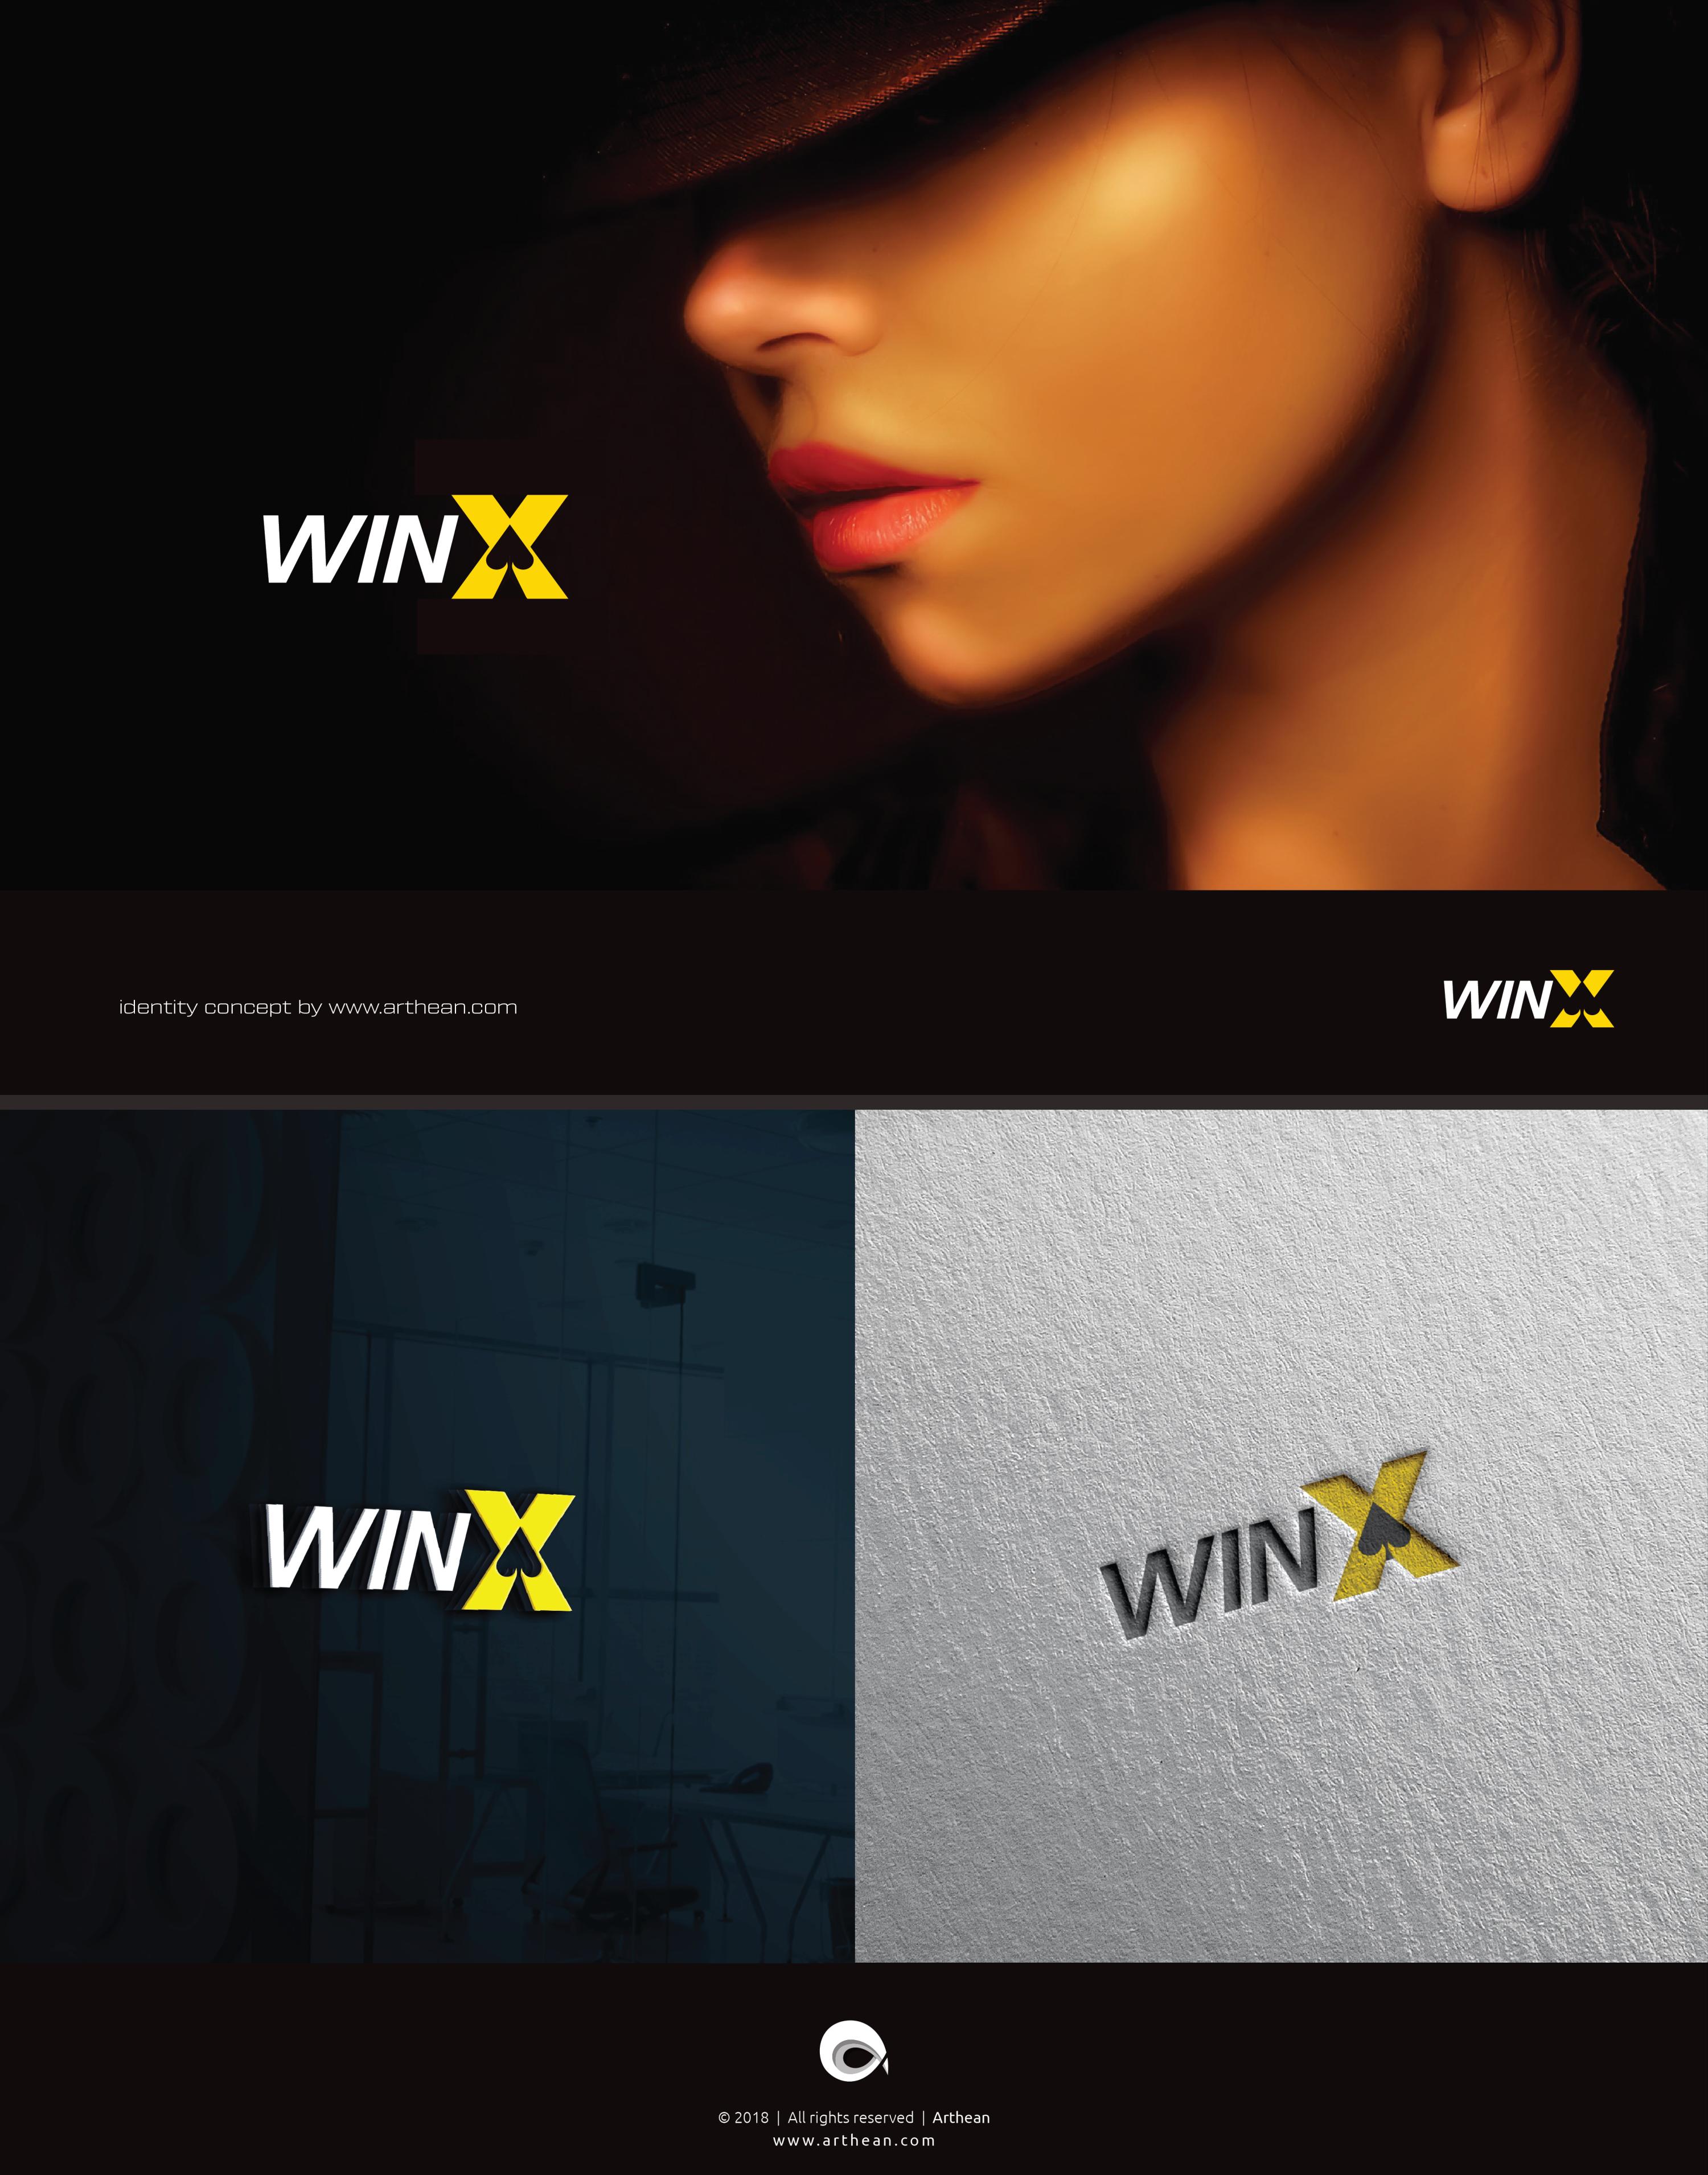 WINX.COM